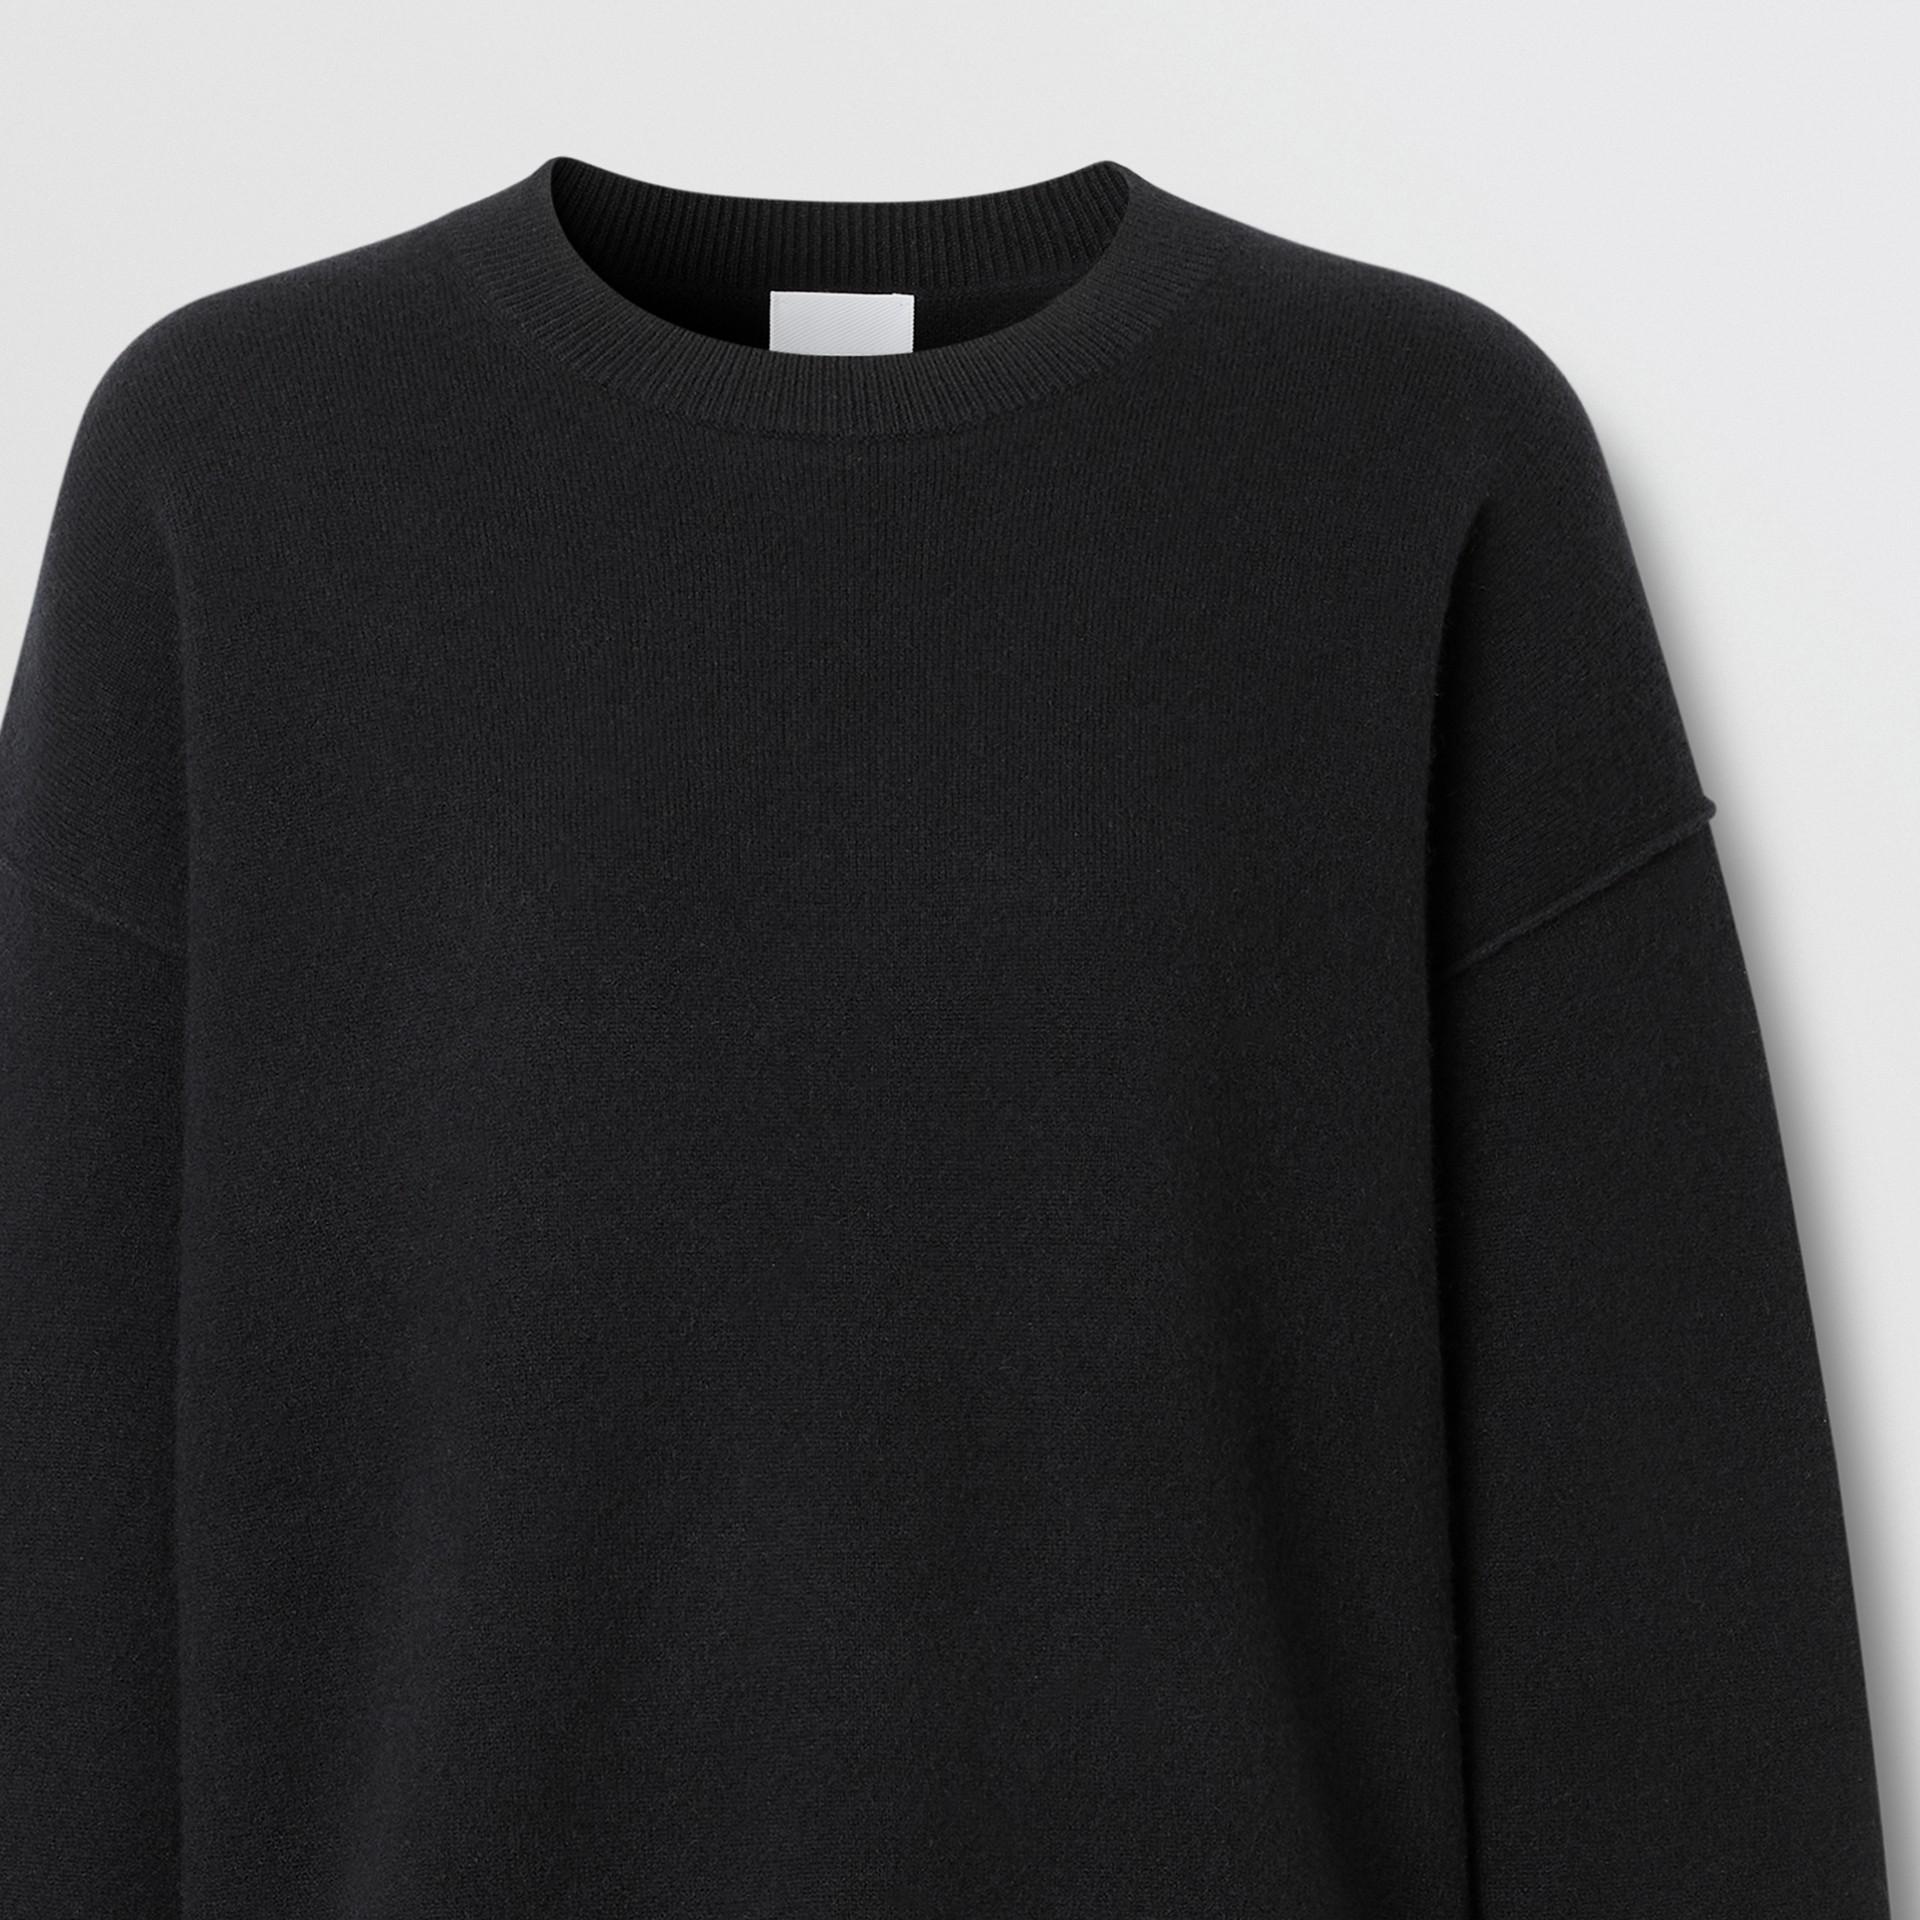 Monogram Motif Cashmere Blend Sweater in Black - Women | Burberry - gallery image 6